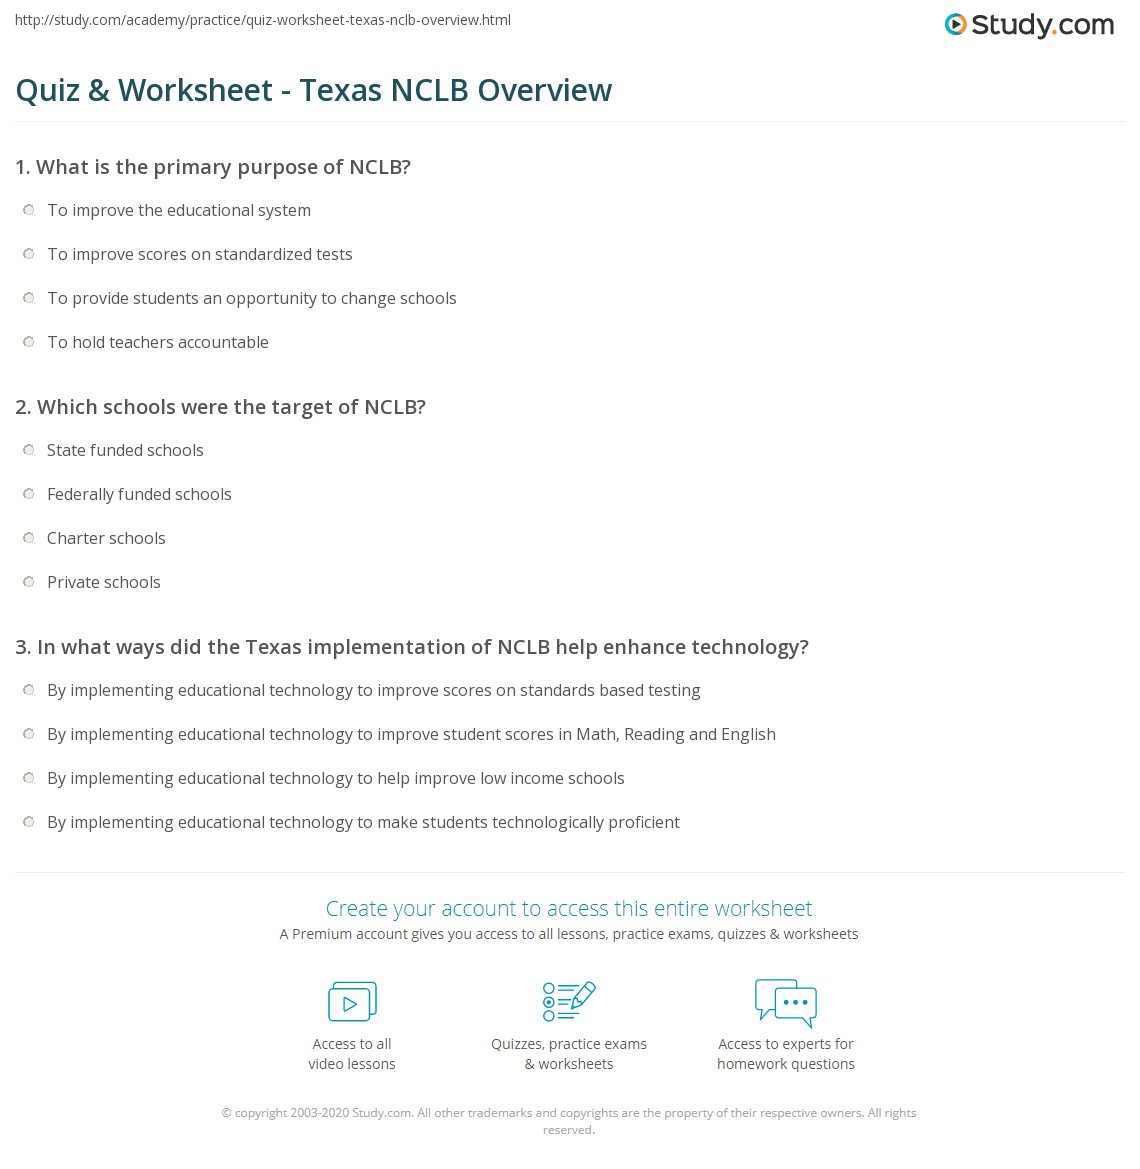 Quiz & Worksheet - Texas NCLB Overview | Study.com